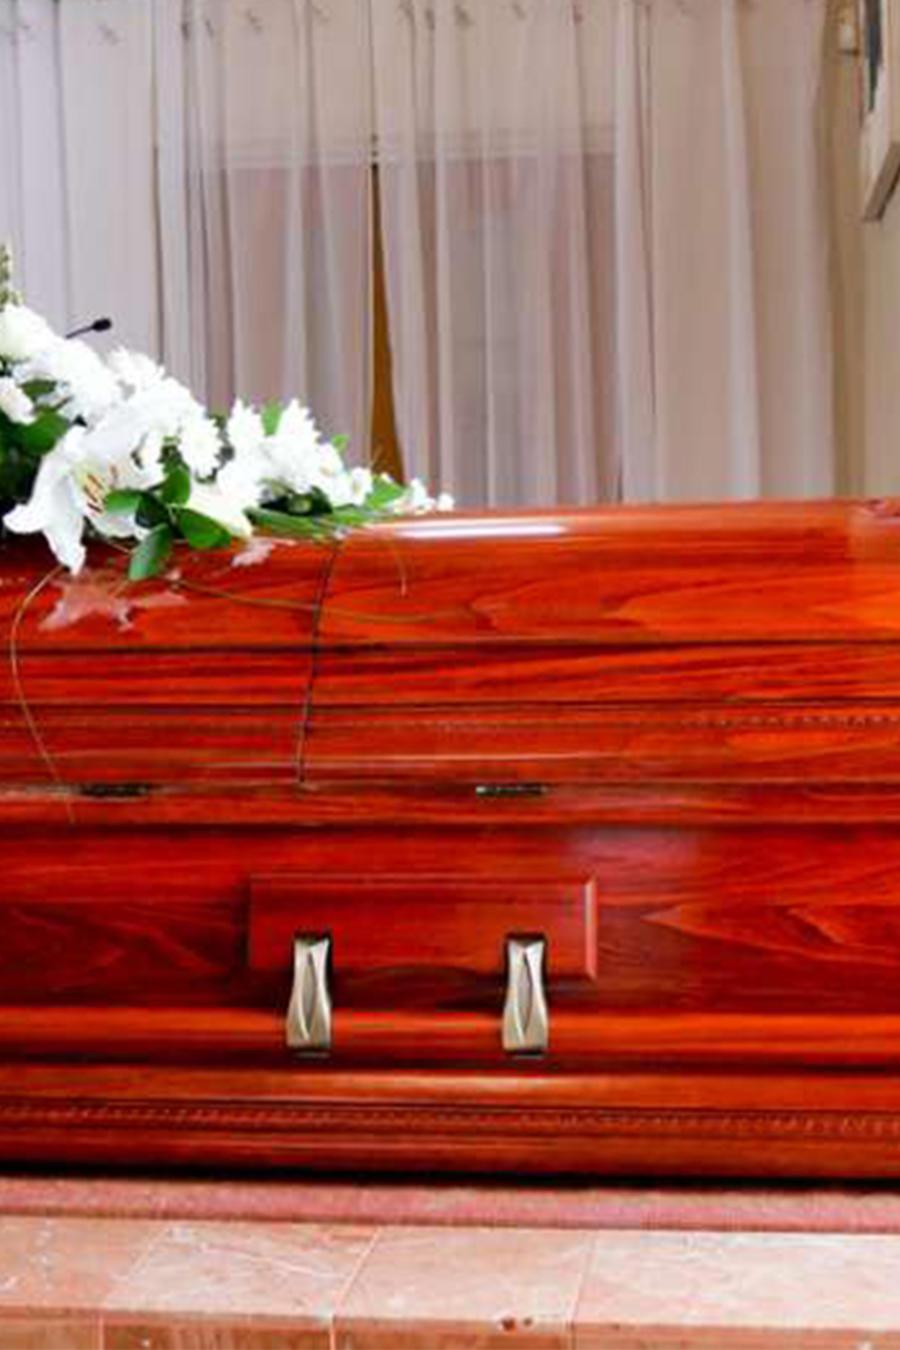 Hombre encuentra a familia celebrando su funeral